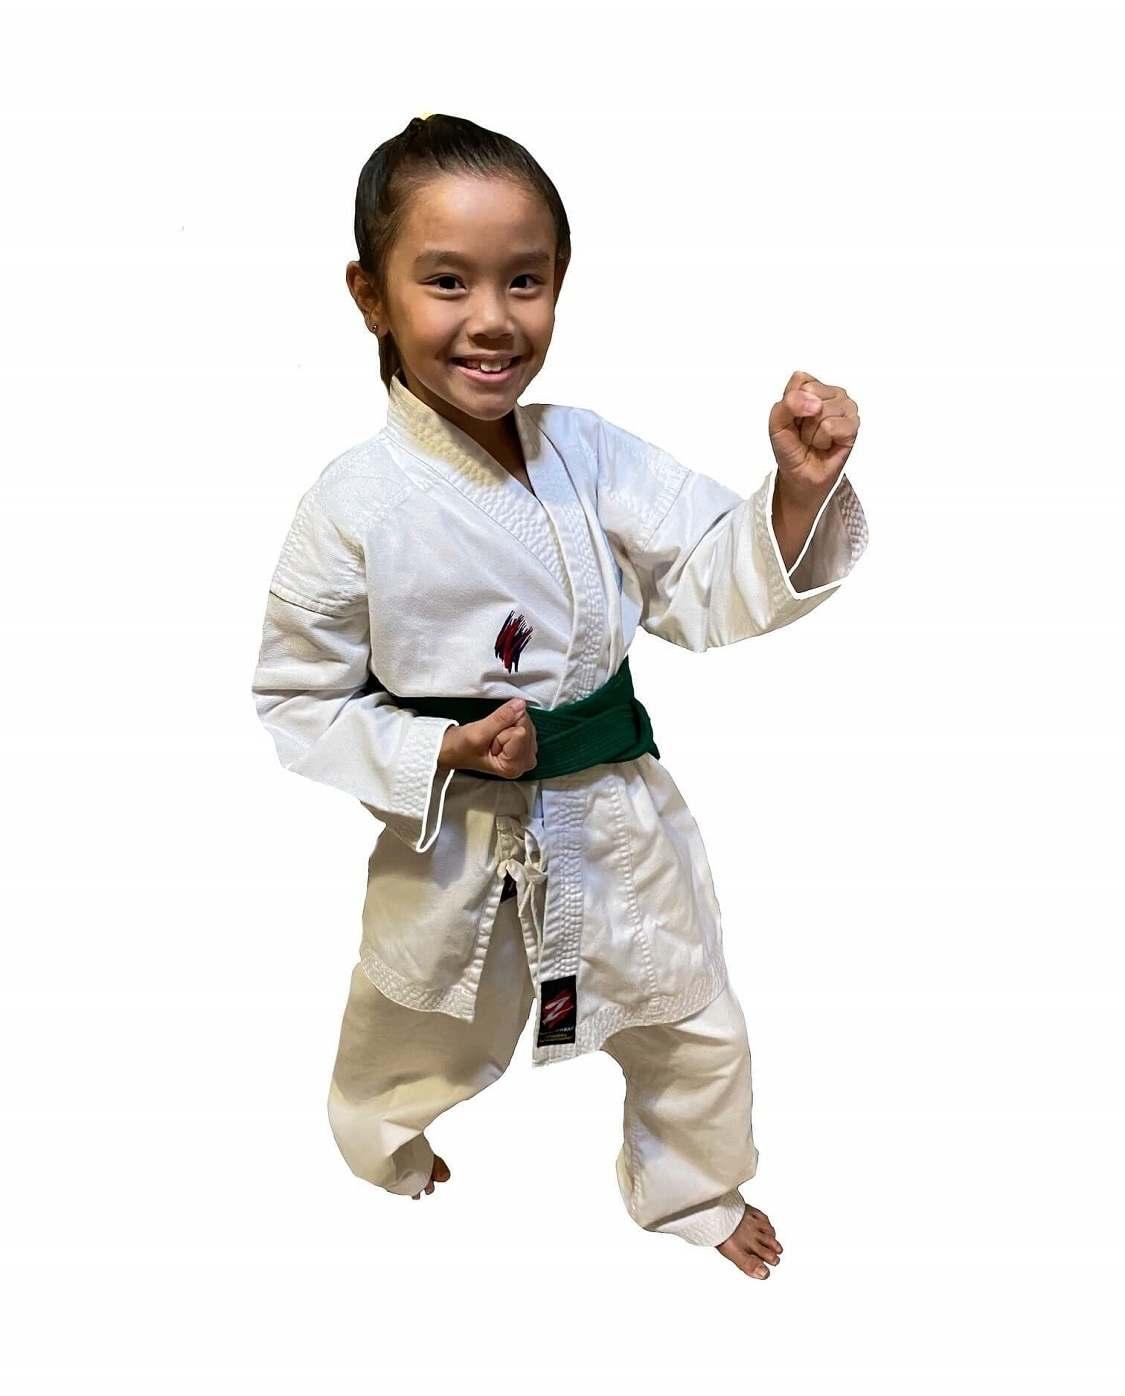 Webp.net Resizeimage, Chosun Black Belt Academy